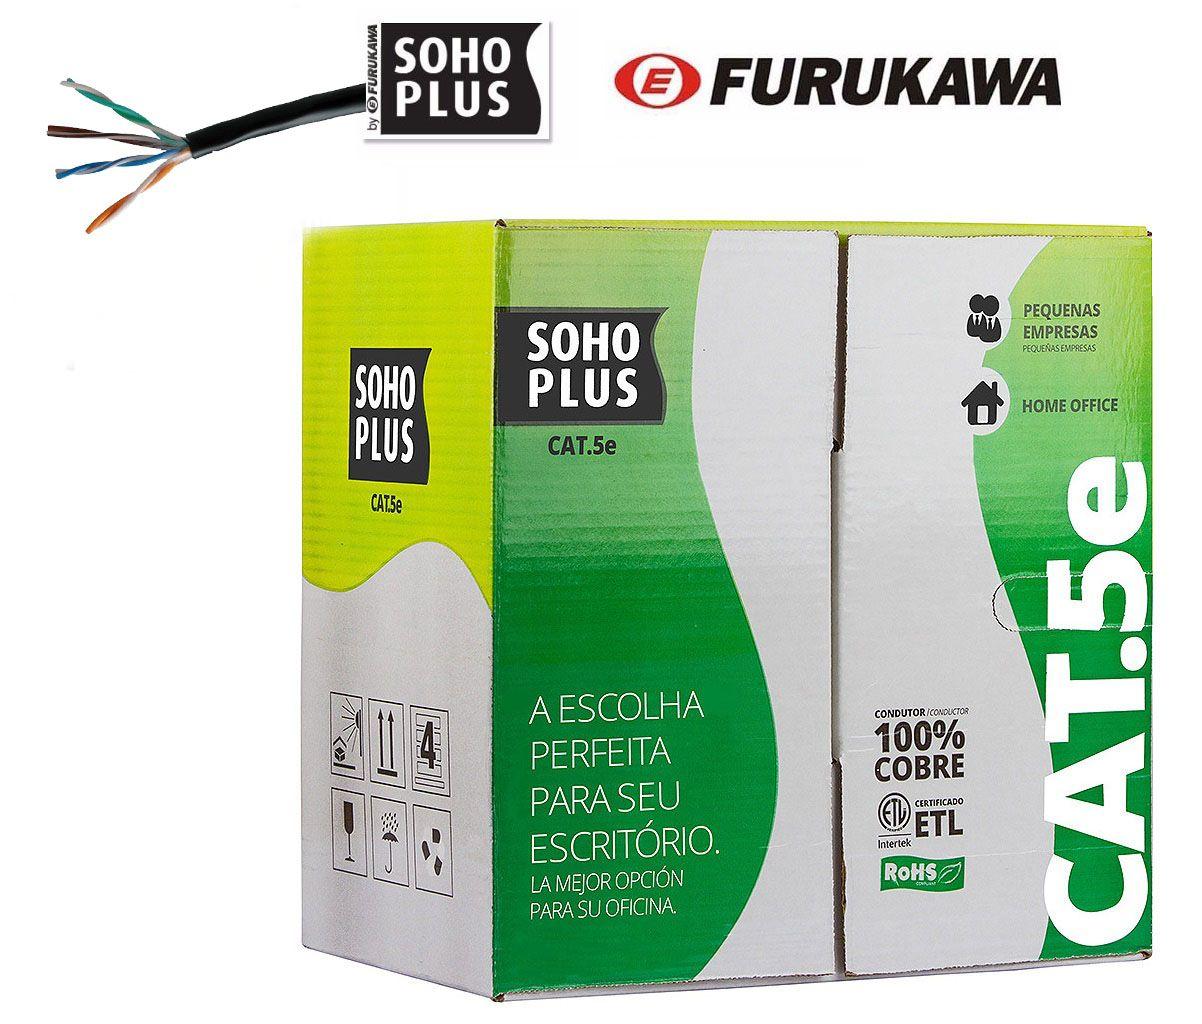 Cabo de Rede Furukawa Cat5e Soho Plus Preto 305 metros